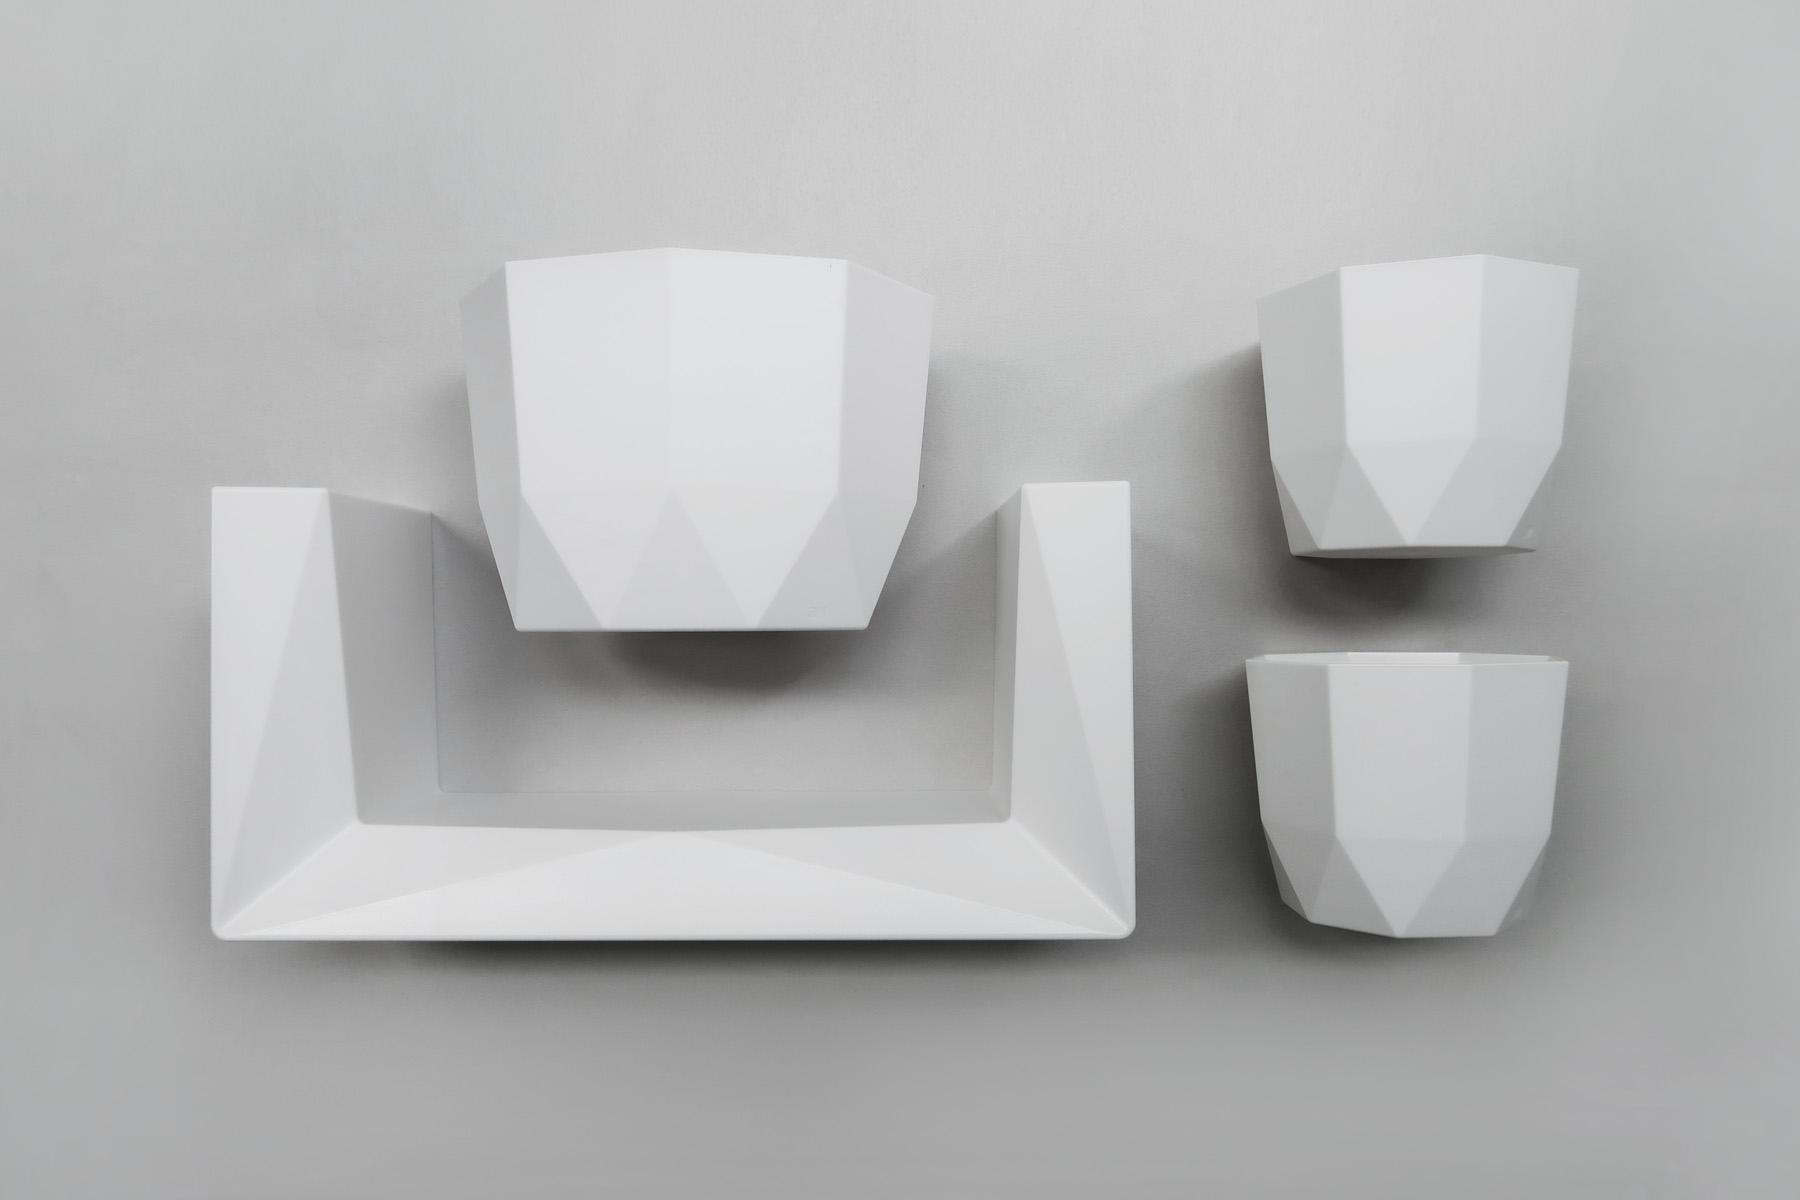 DIY 居家佈置 / 幾何美學・3M 無痕置物收納 - STEP001